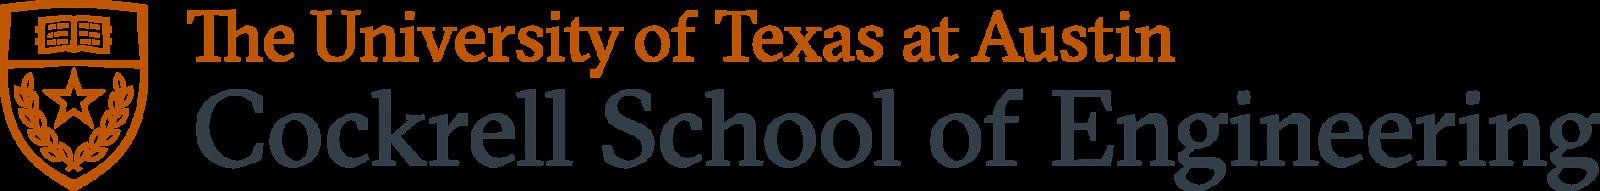 cockrell school formal logo